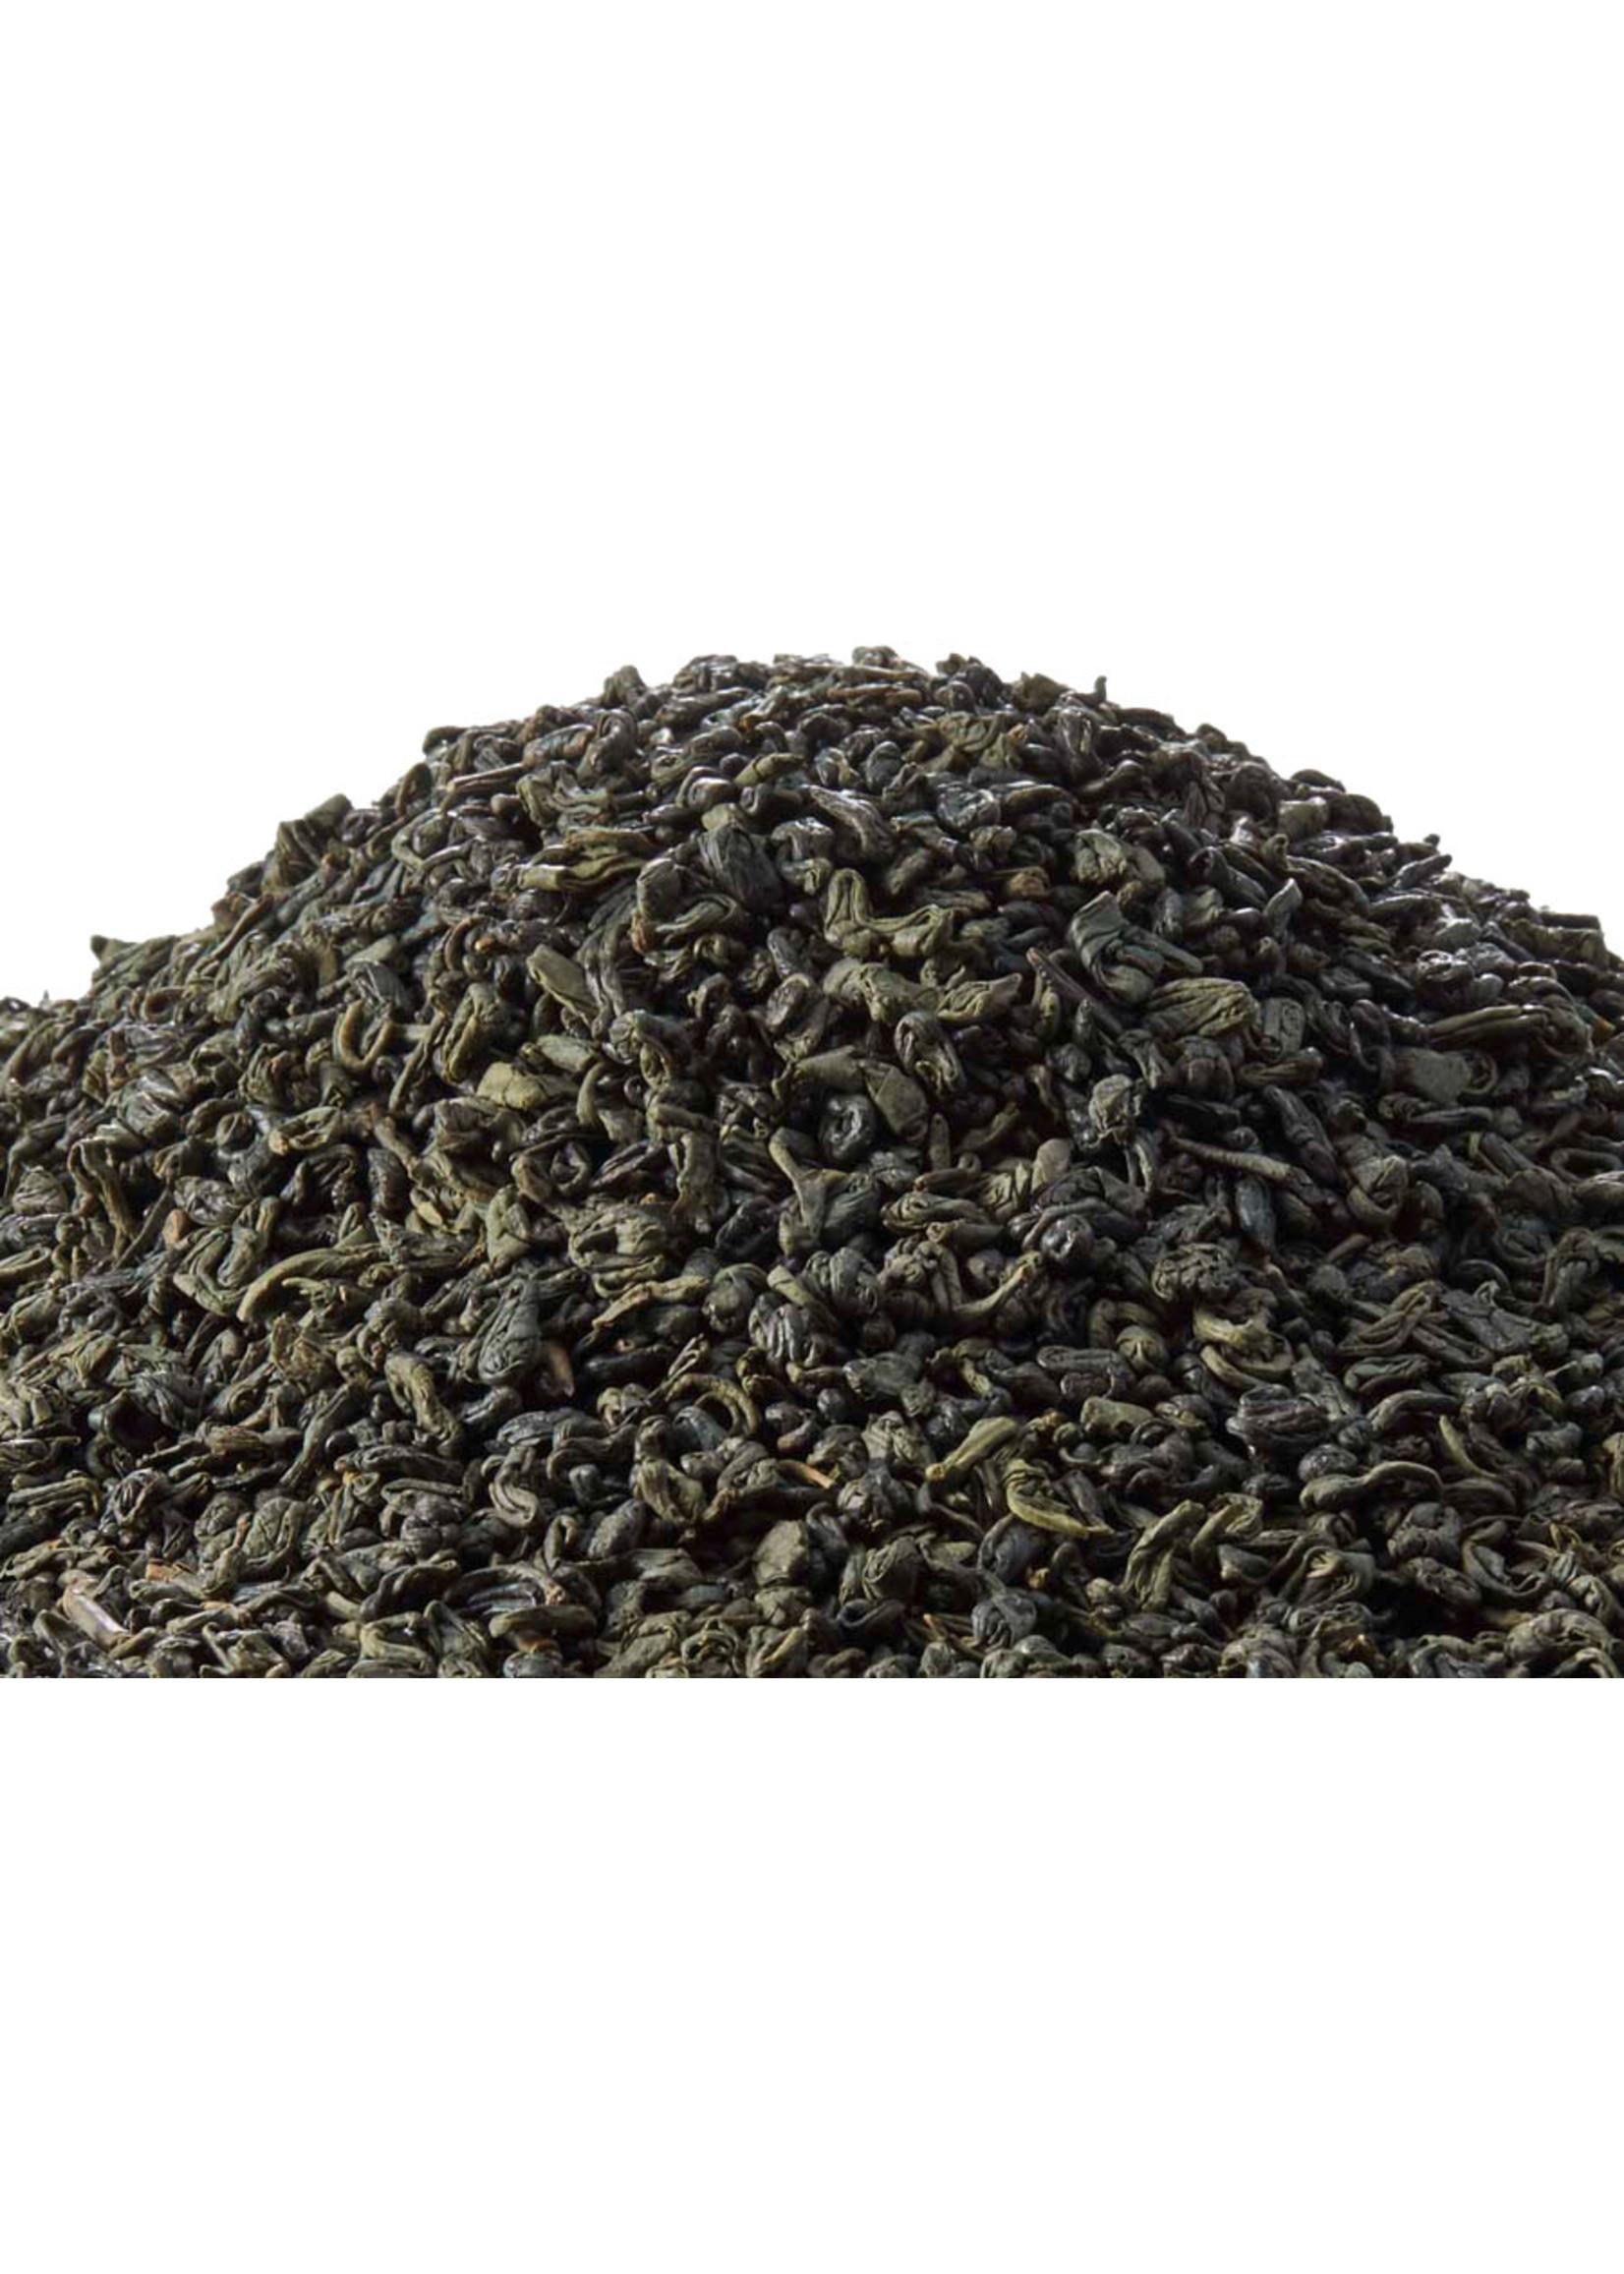 De KoffieMeulen China Gunpowder Temple of Heaven